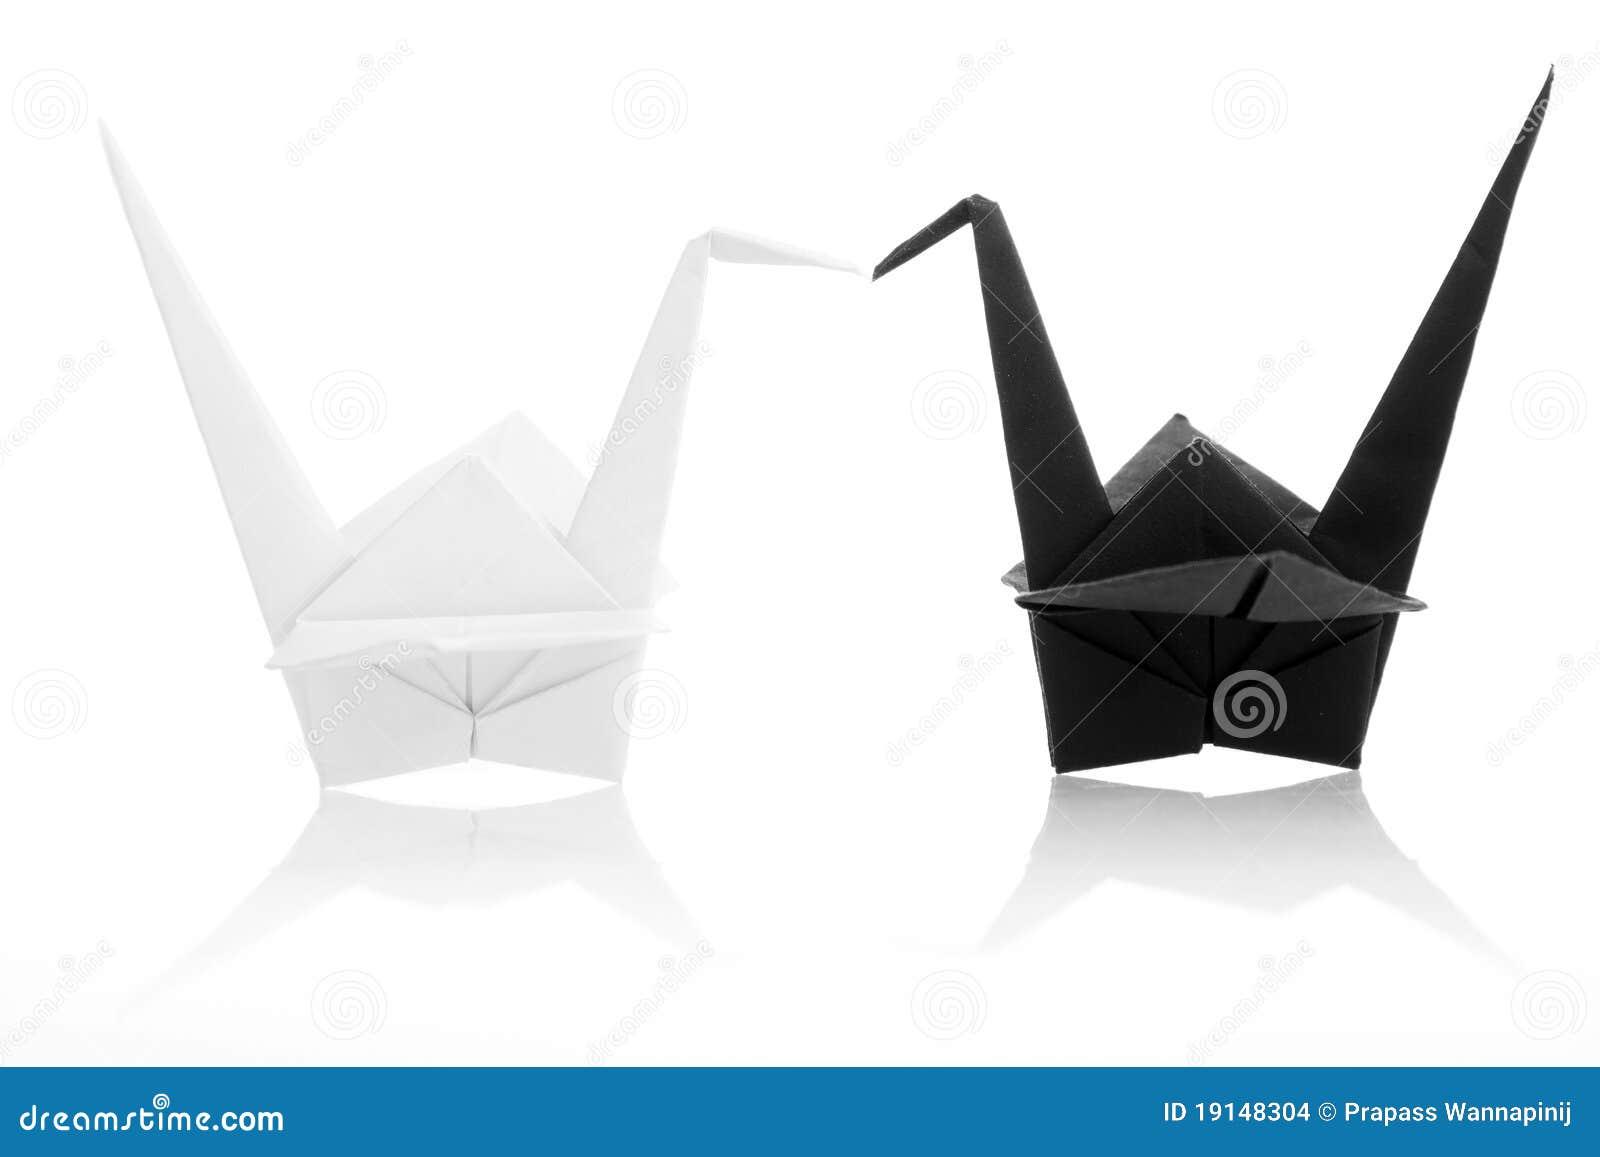 grue japonaise traditionnelle noire et blanche d 39 origami images stock image 19148304. Black Bedroom Furniture Sets. Home Design Ideas